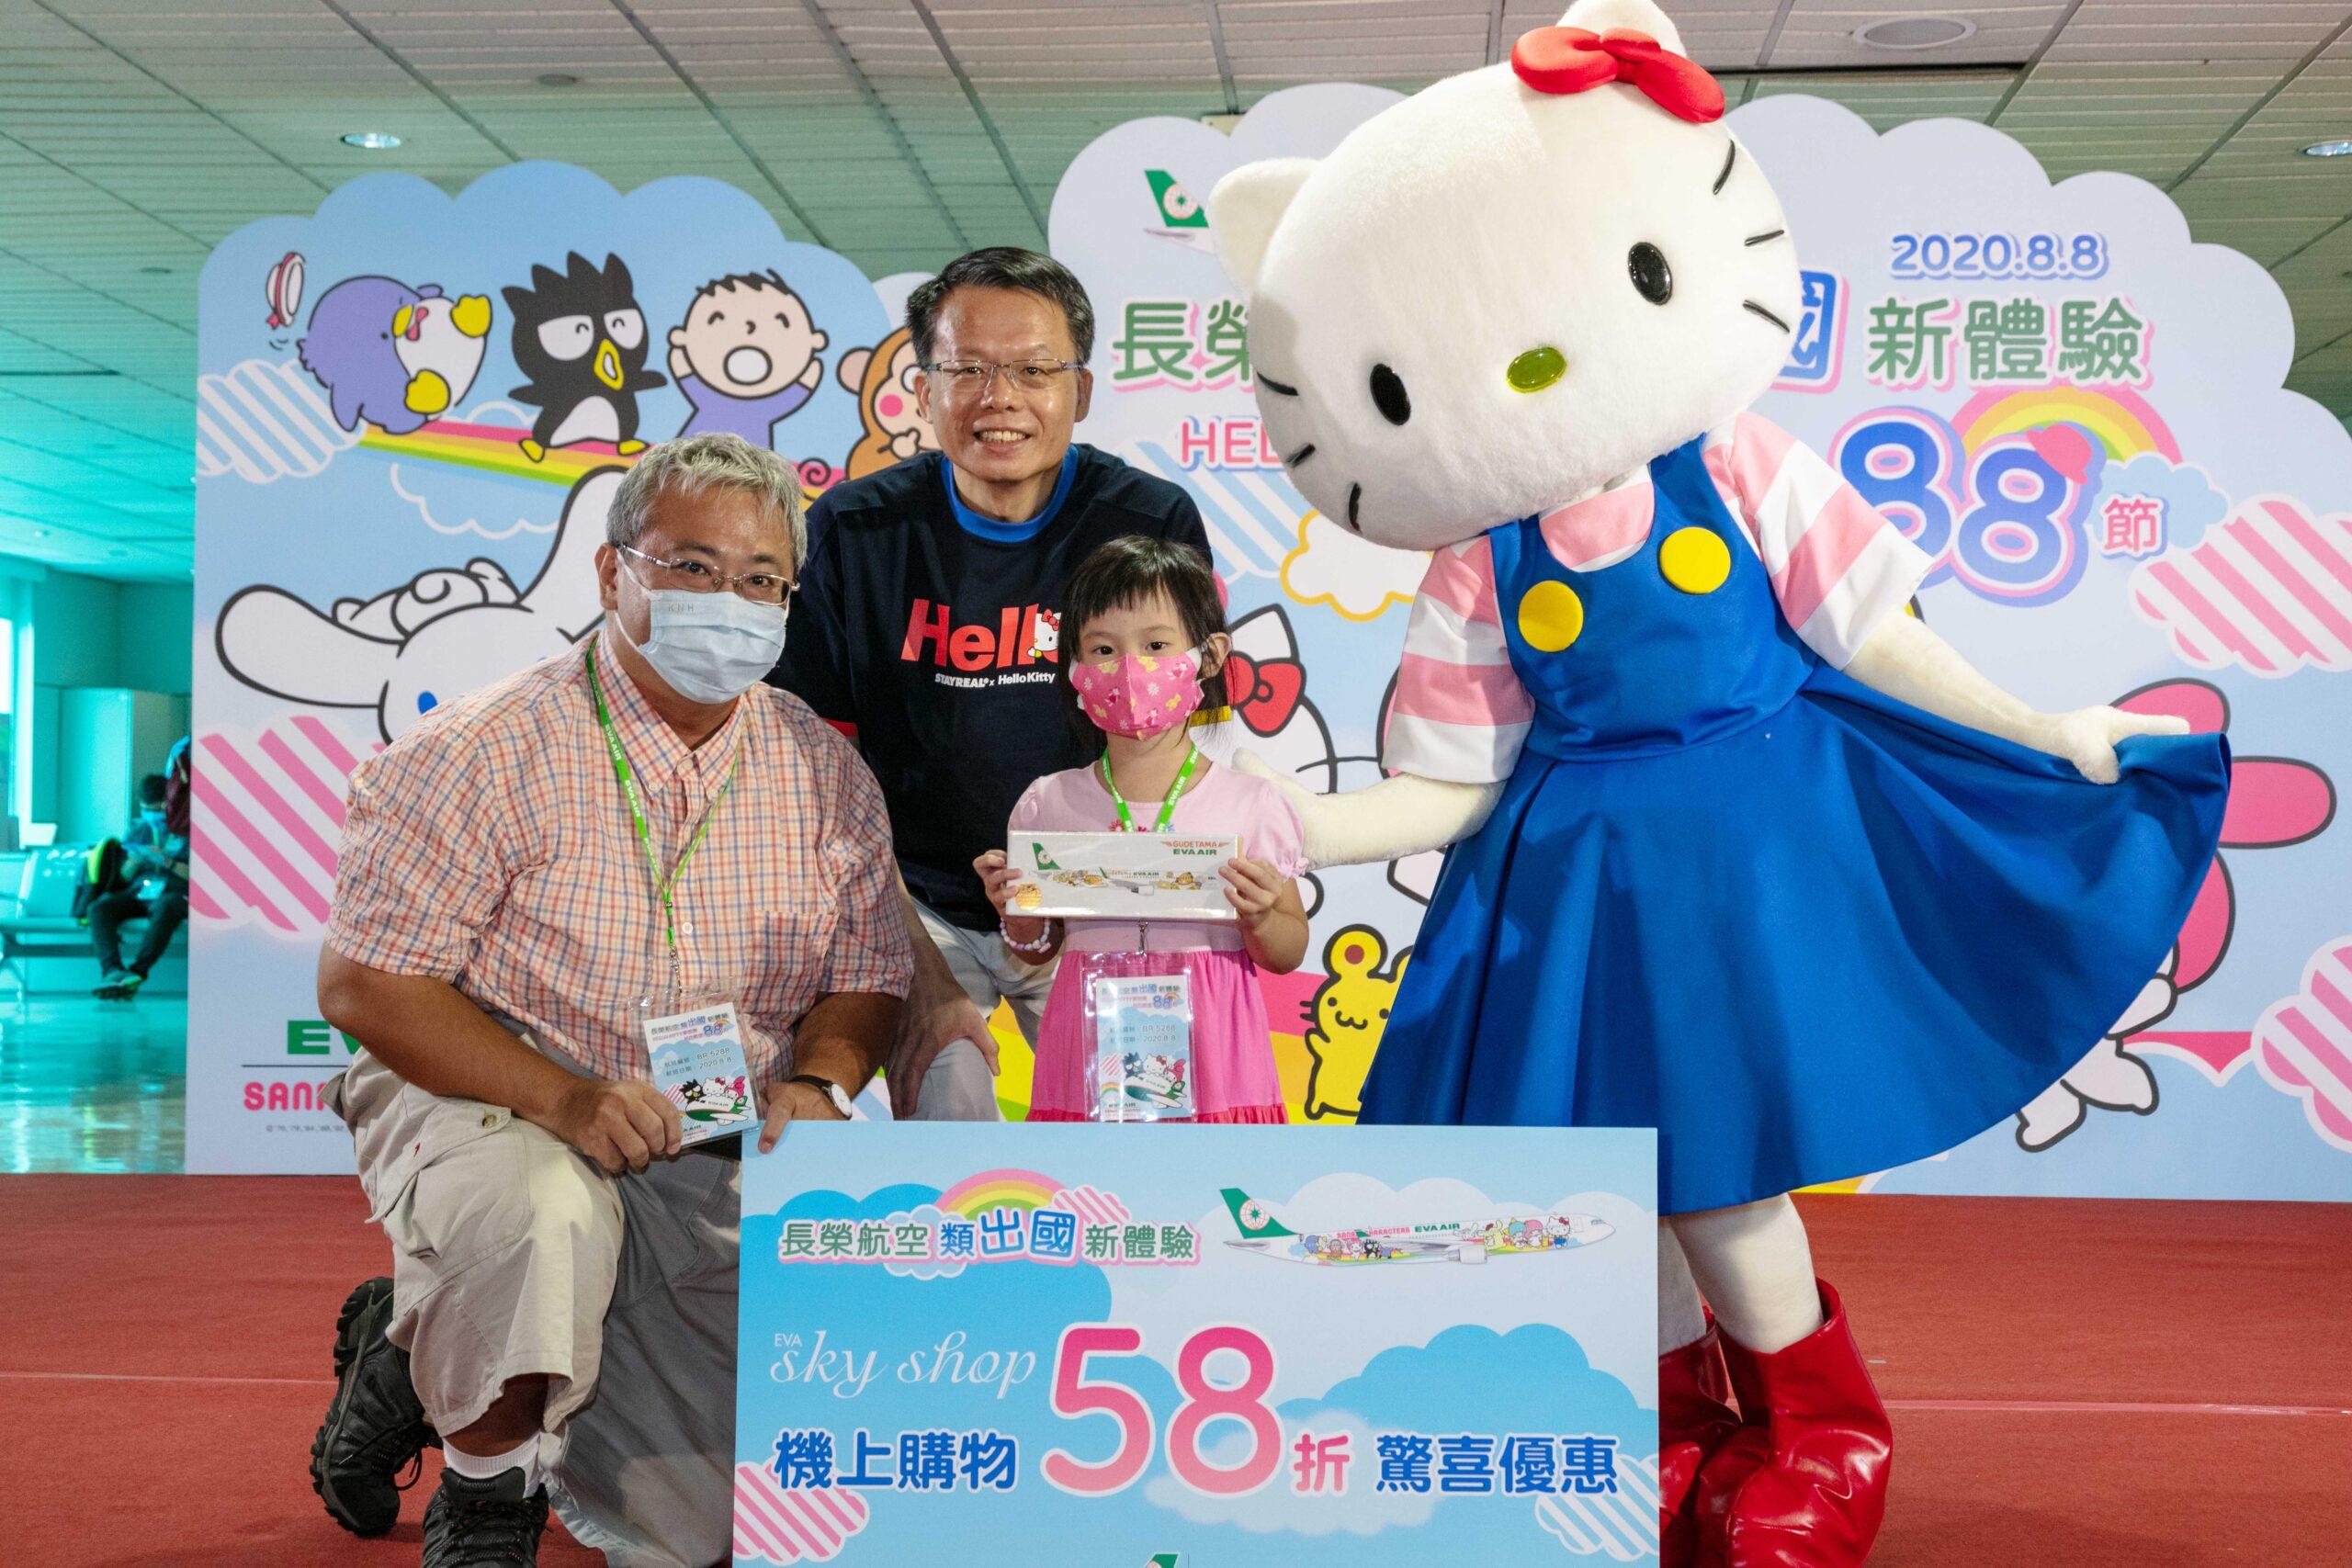 Eva Air Fathers Day flight with Hello Kitty